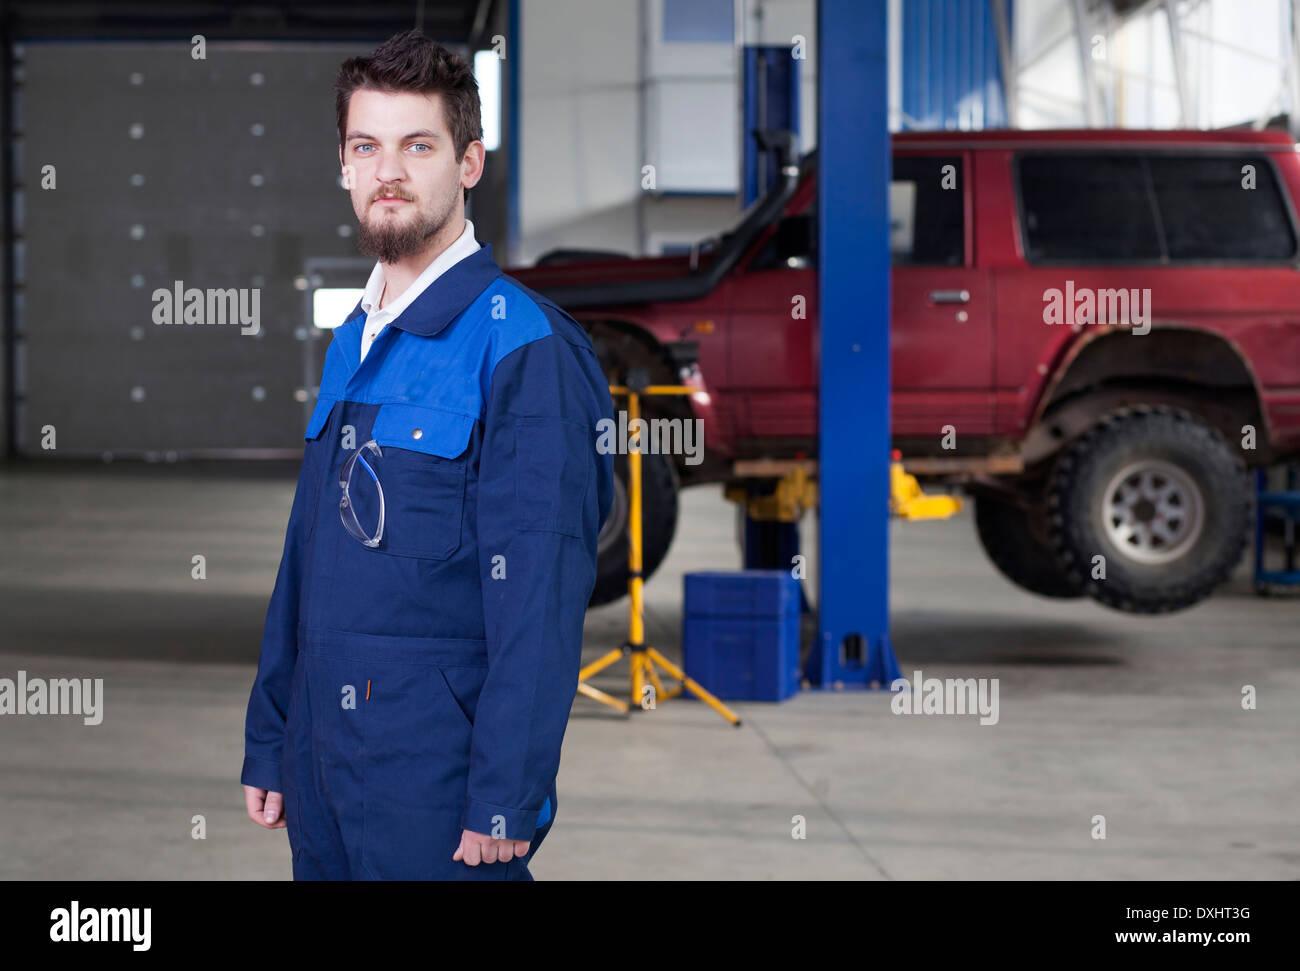 Car mechanic at work - Stock Image